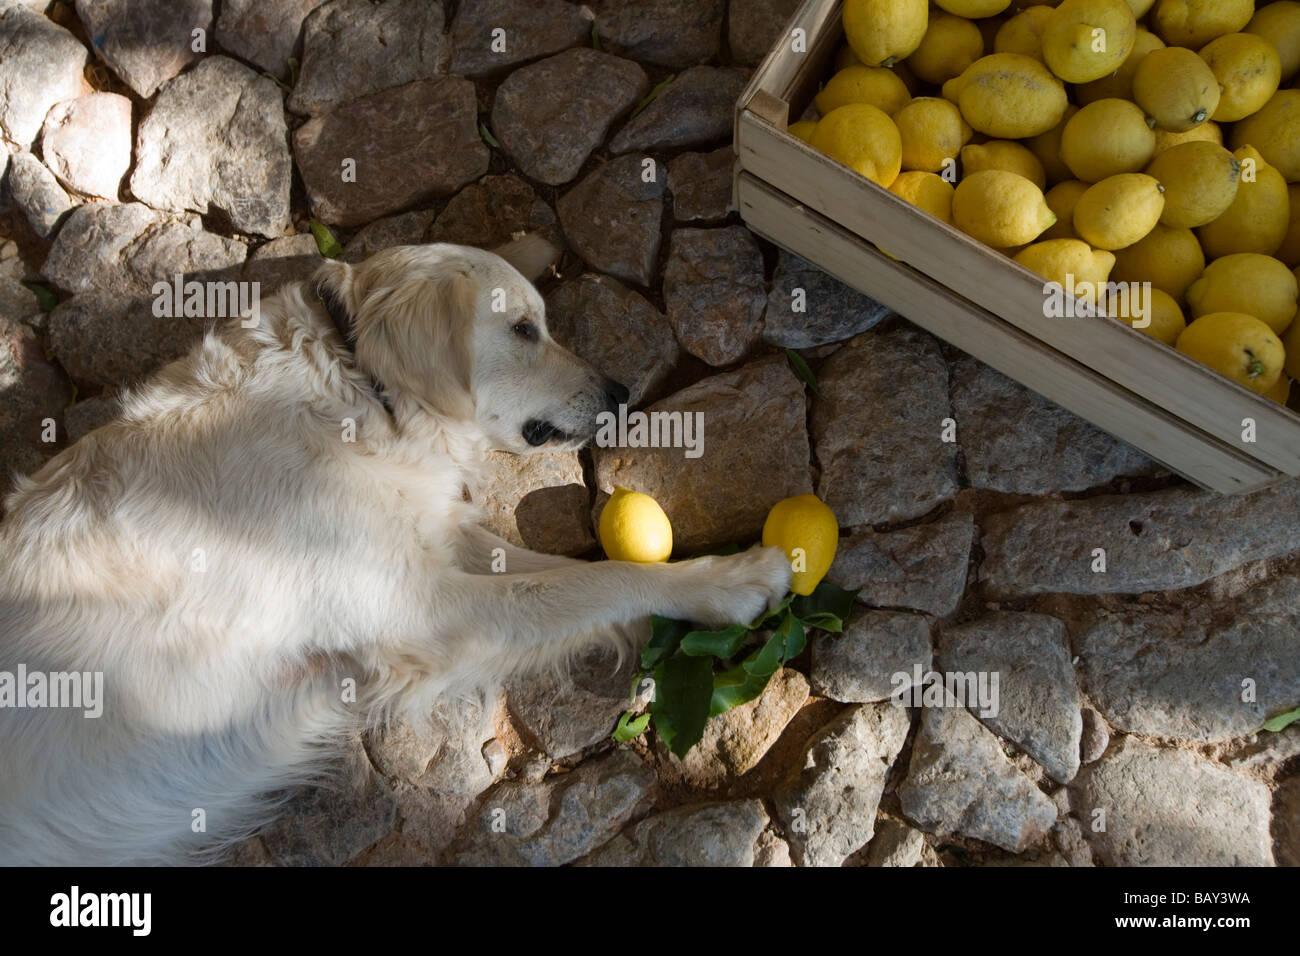 Max Loves Lemons, Resident Dog at Finca Hotel CanColl, Soller, Mallorca, Balearic Islands, Spain - Stock Image